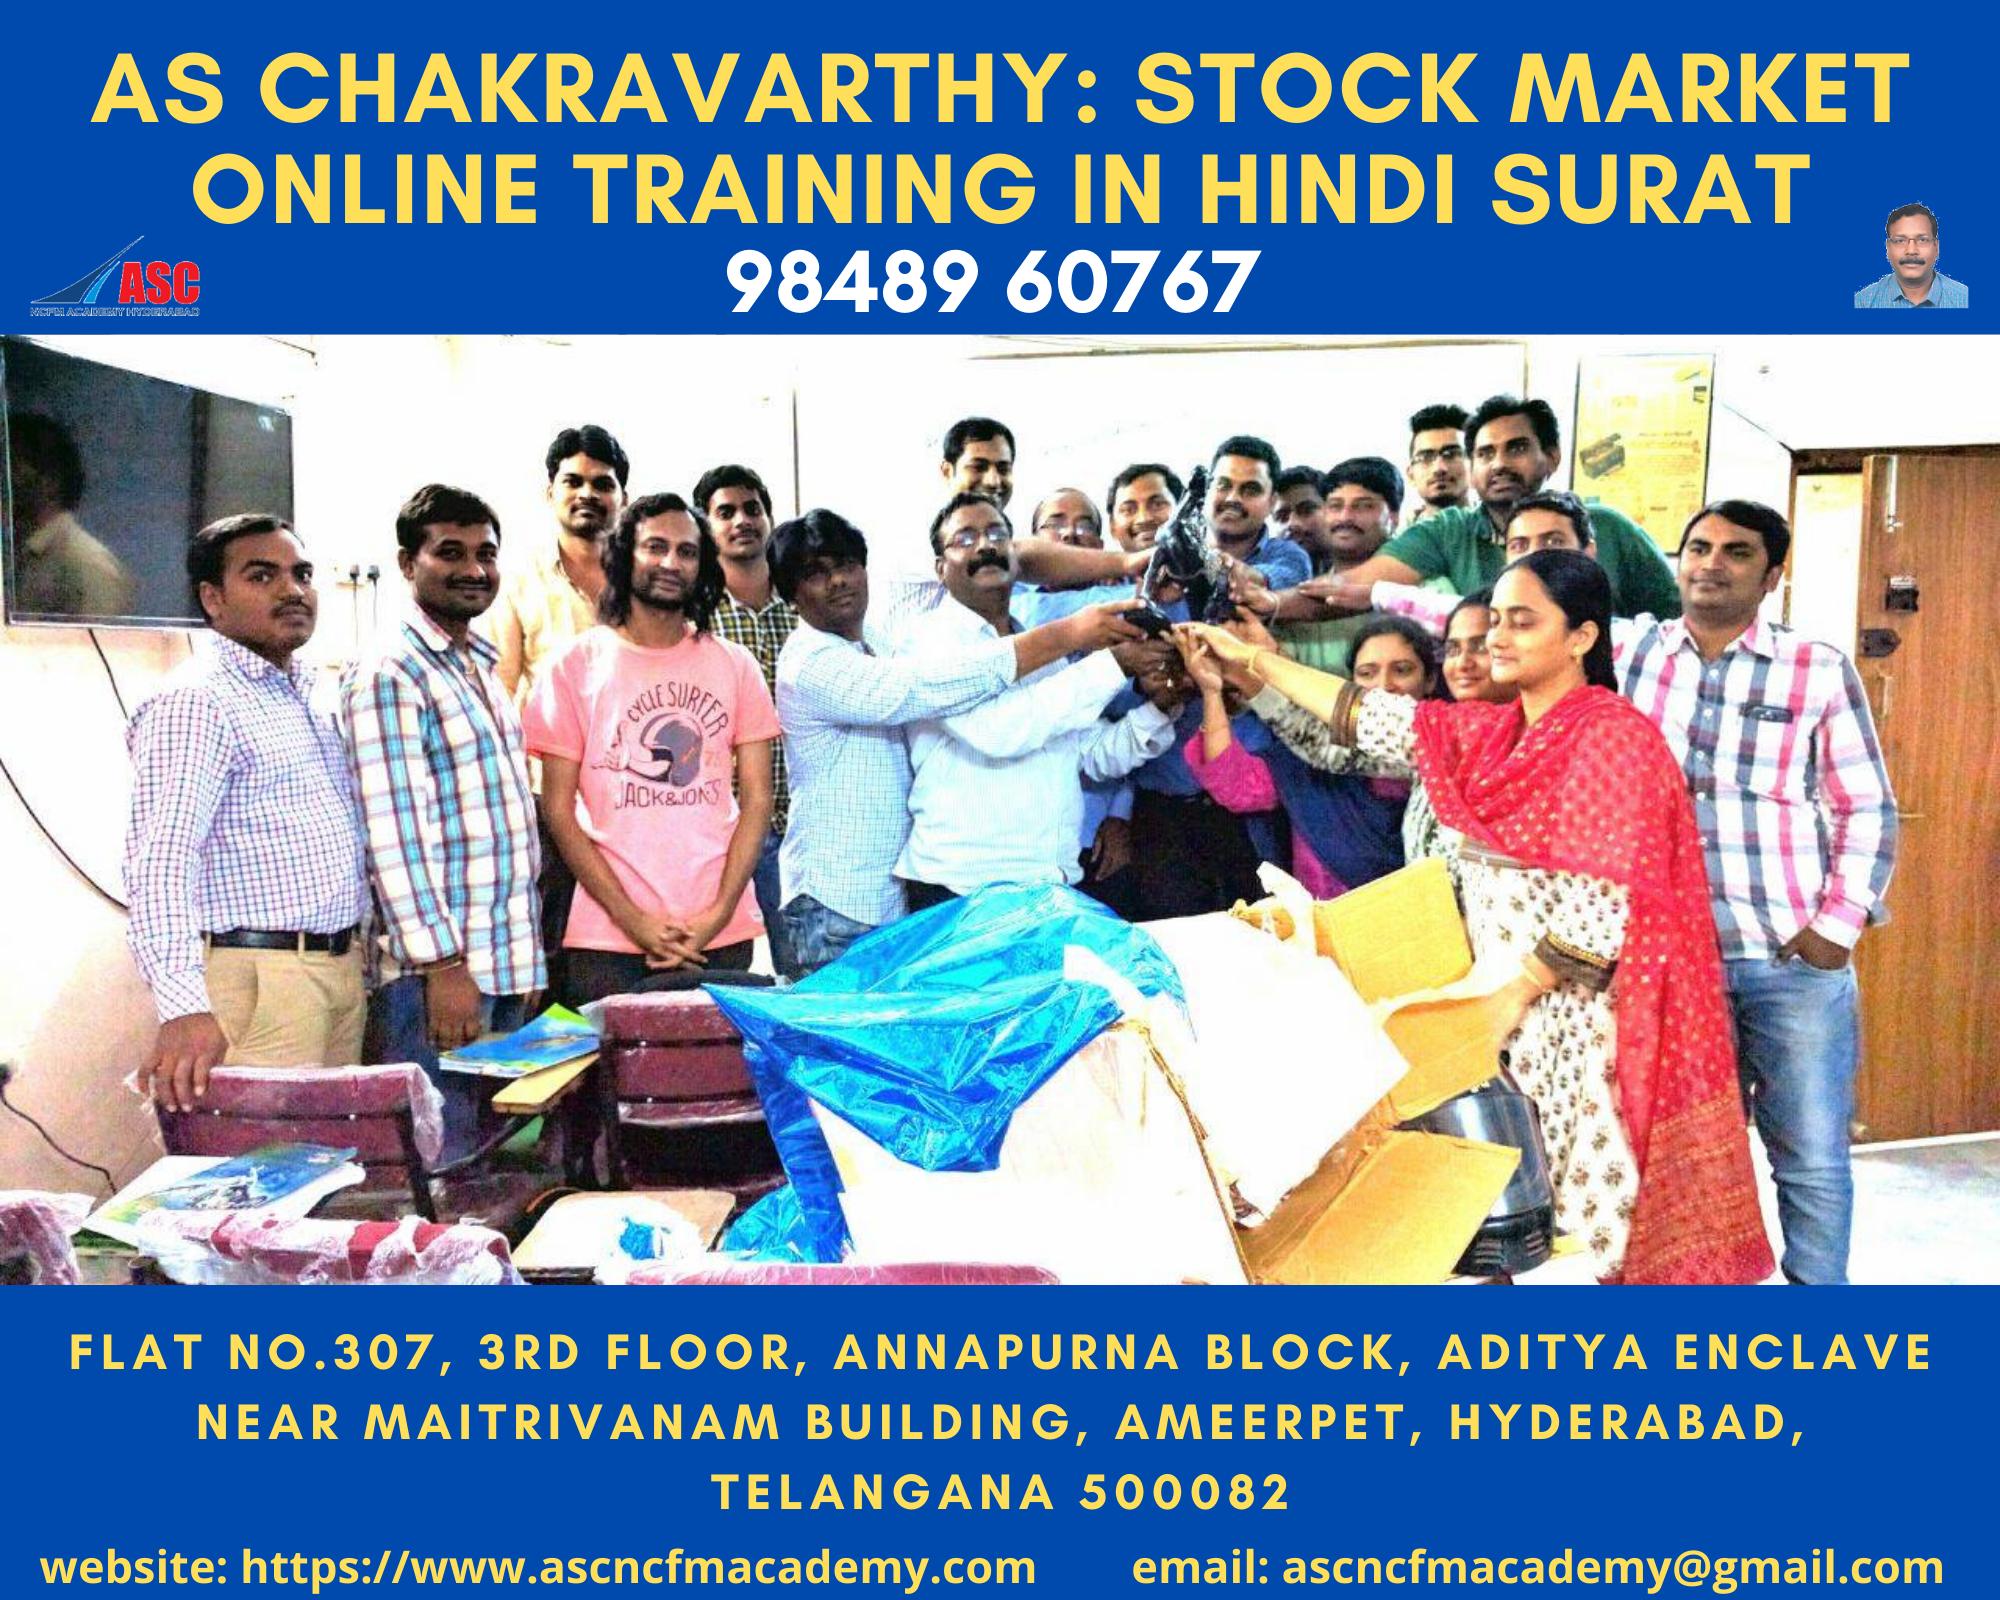 Online Stock Market Technical Training in Hindi Surat